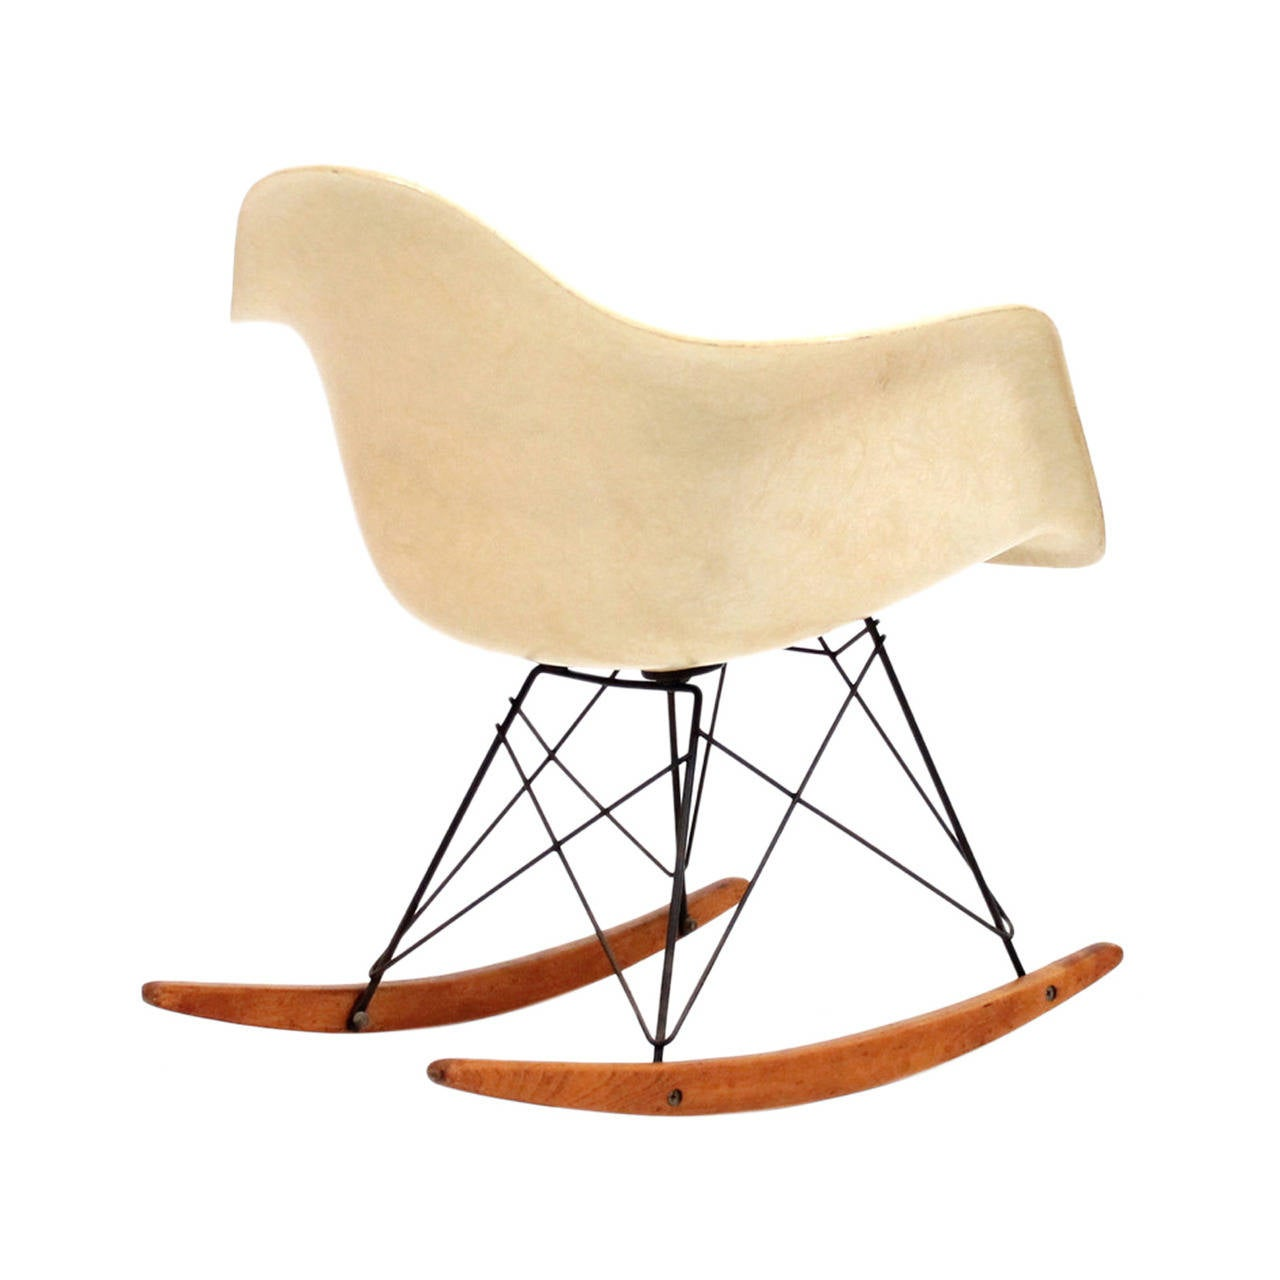 herman miller eames zenith rar rocking chair at 1stdibs